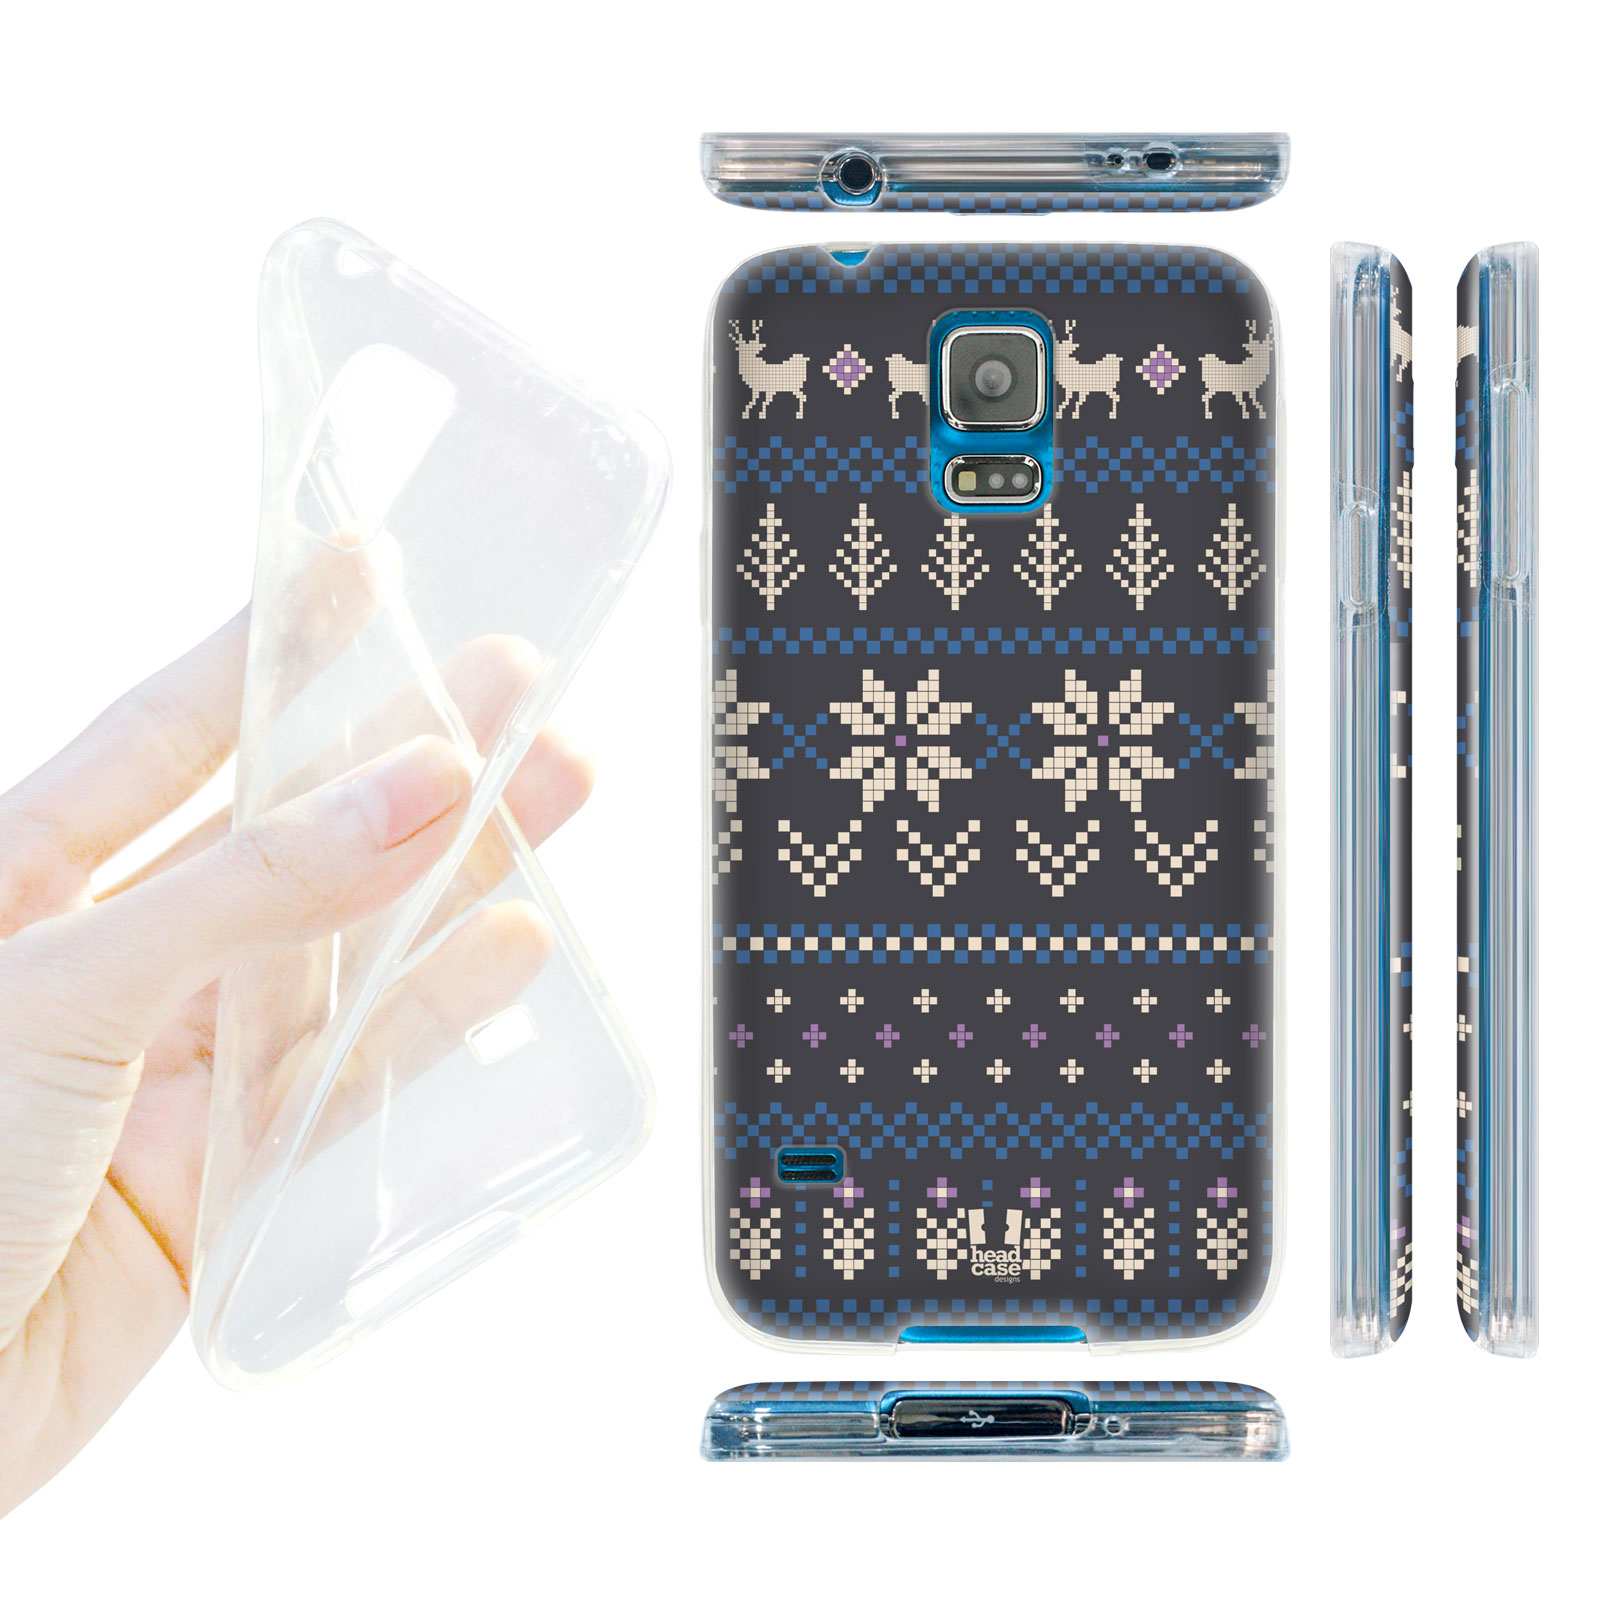 1e65346c0 HEAD CASE silikonový obal na mobil Samsung galaxy S5 zimní motiv modrá a  šedá